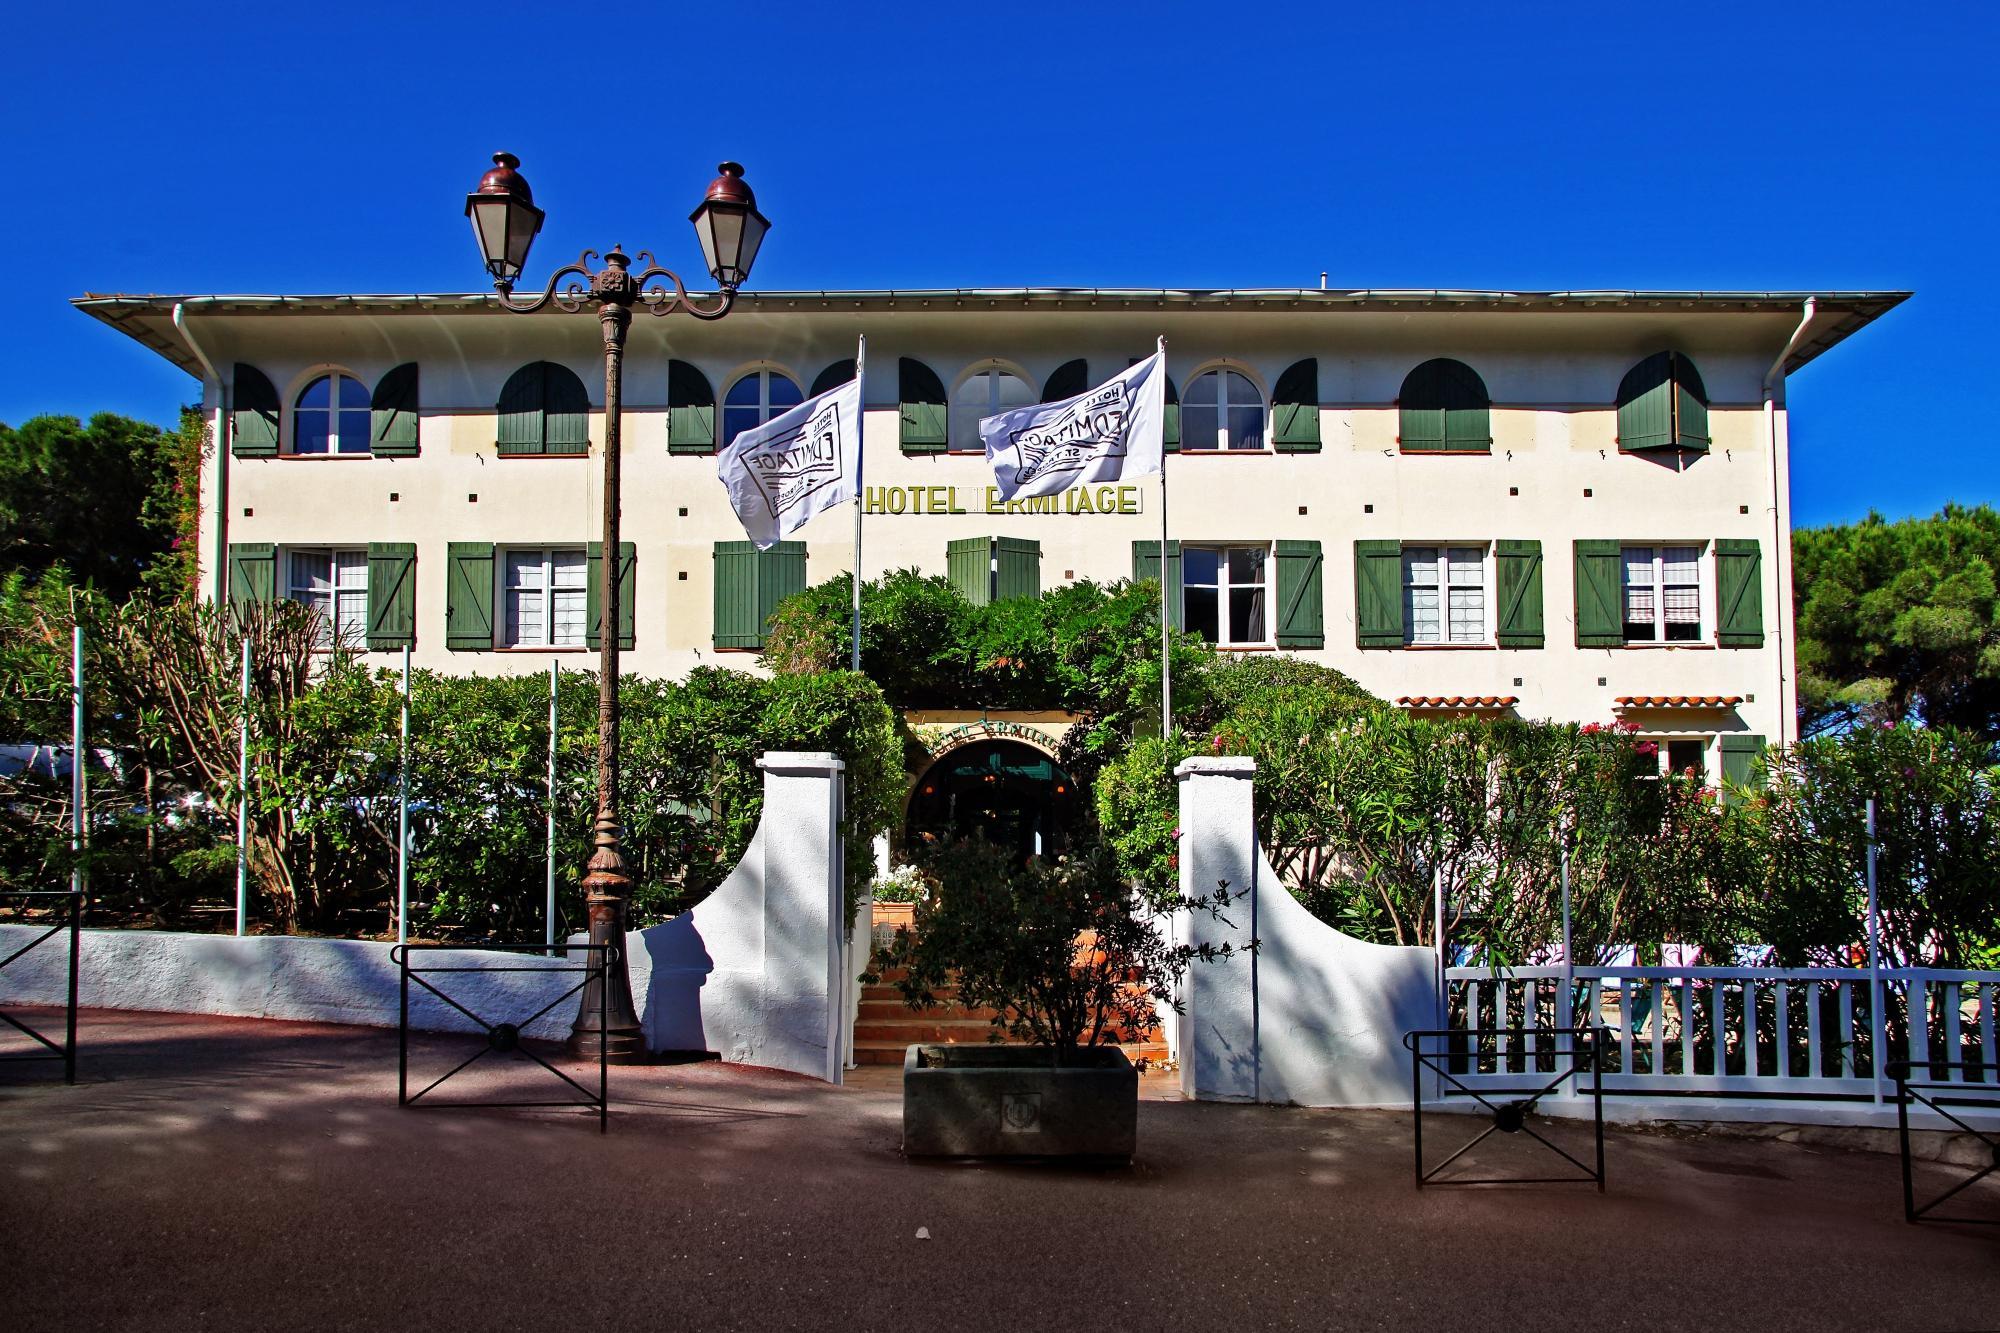 Hotel Ermitage